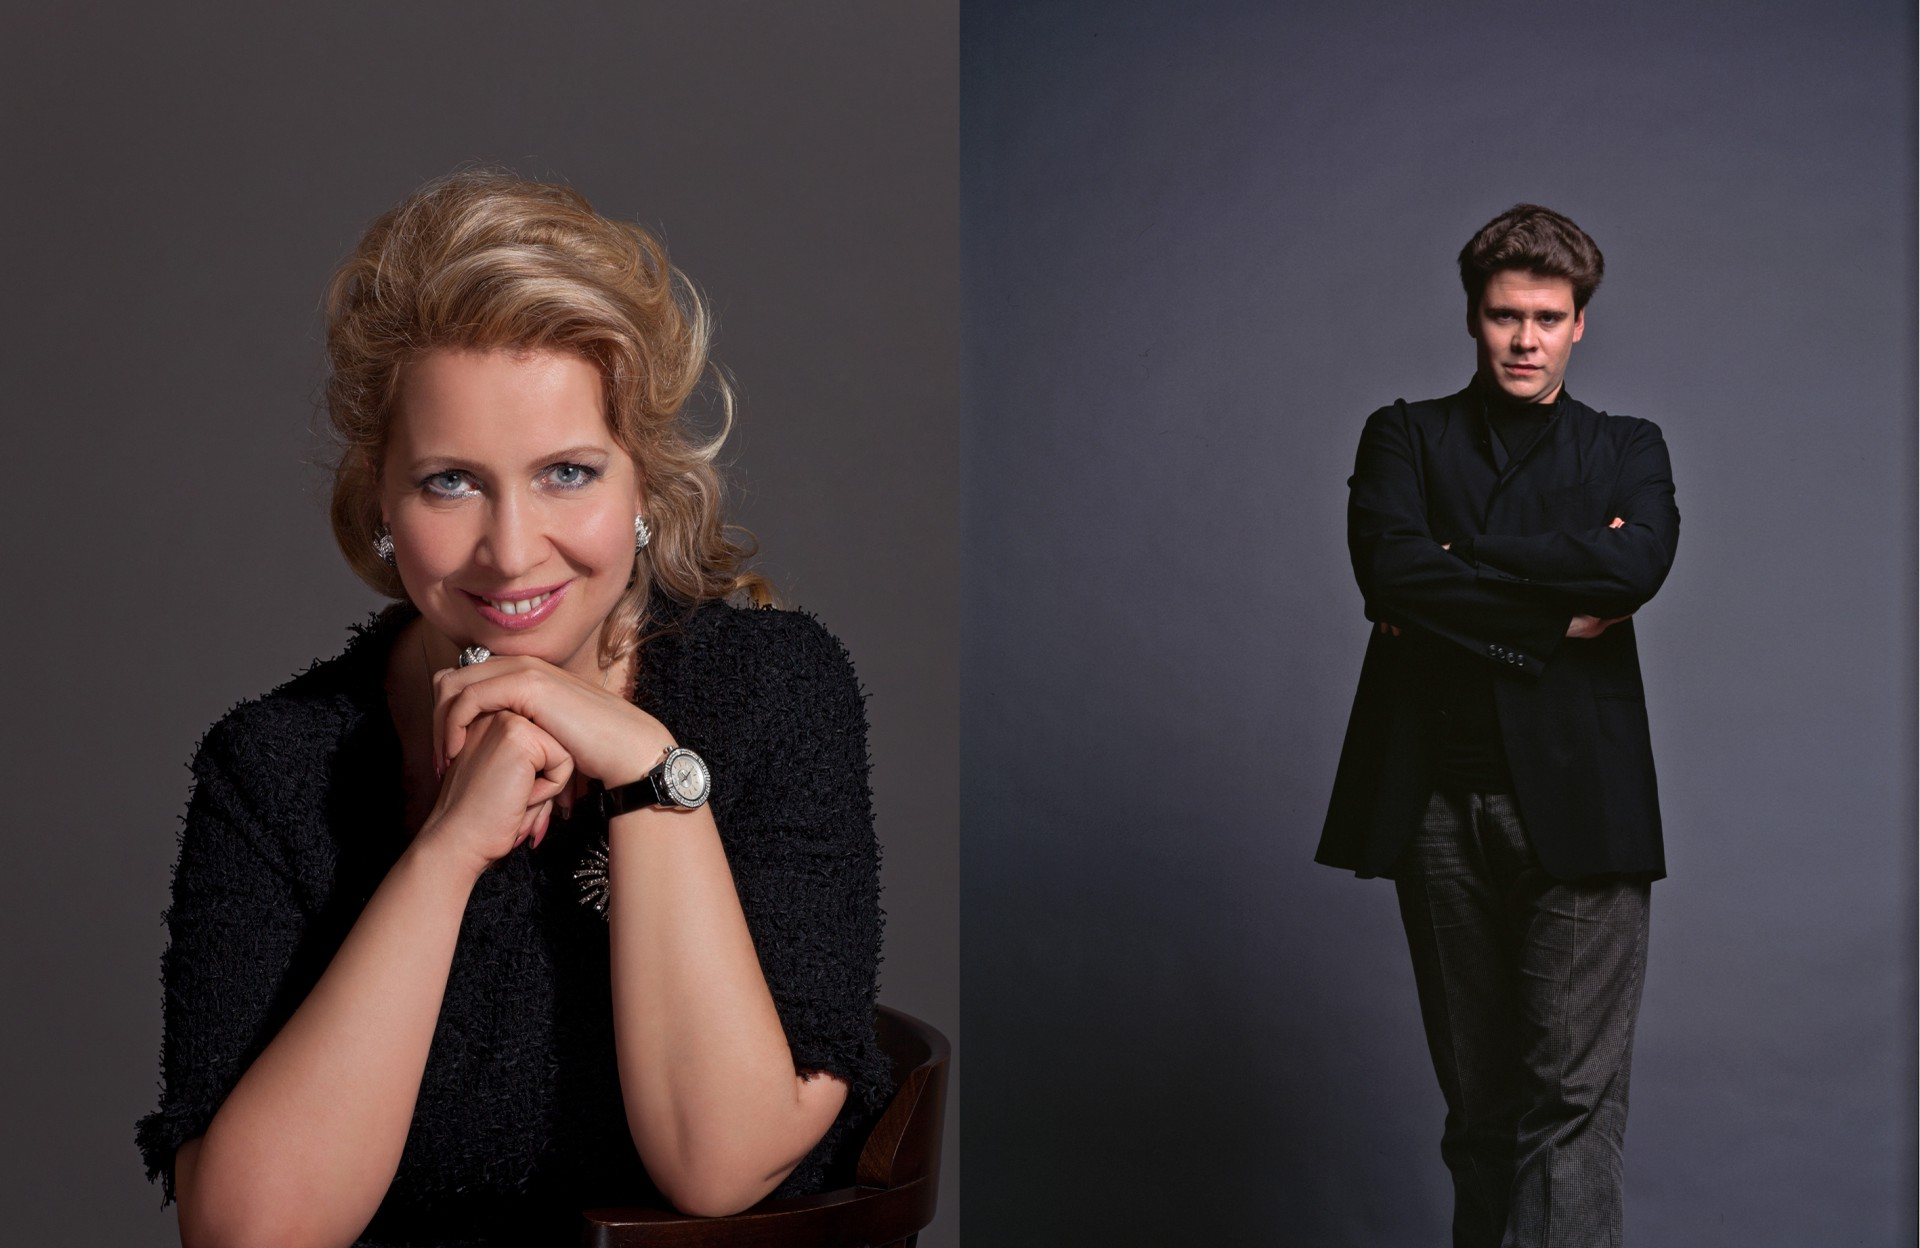 Светлана Медведева, 2011 // Денис Мацуев , 2006